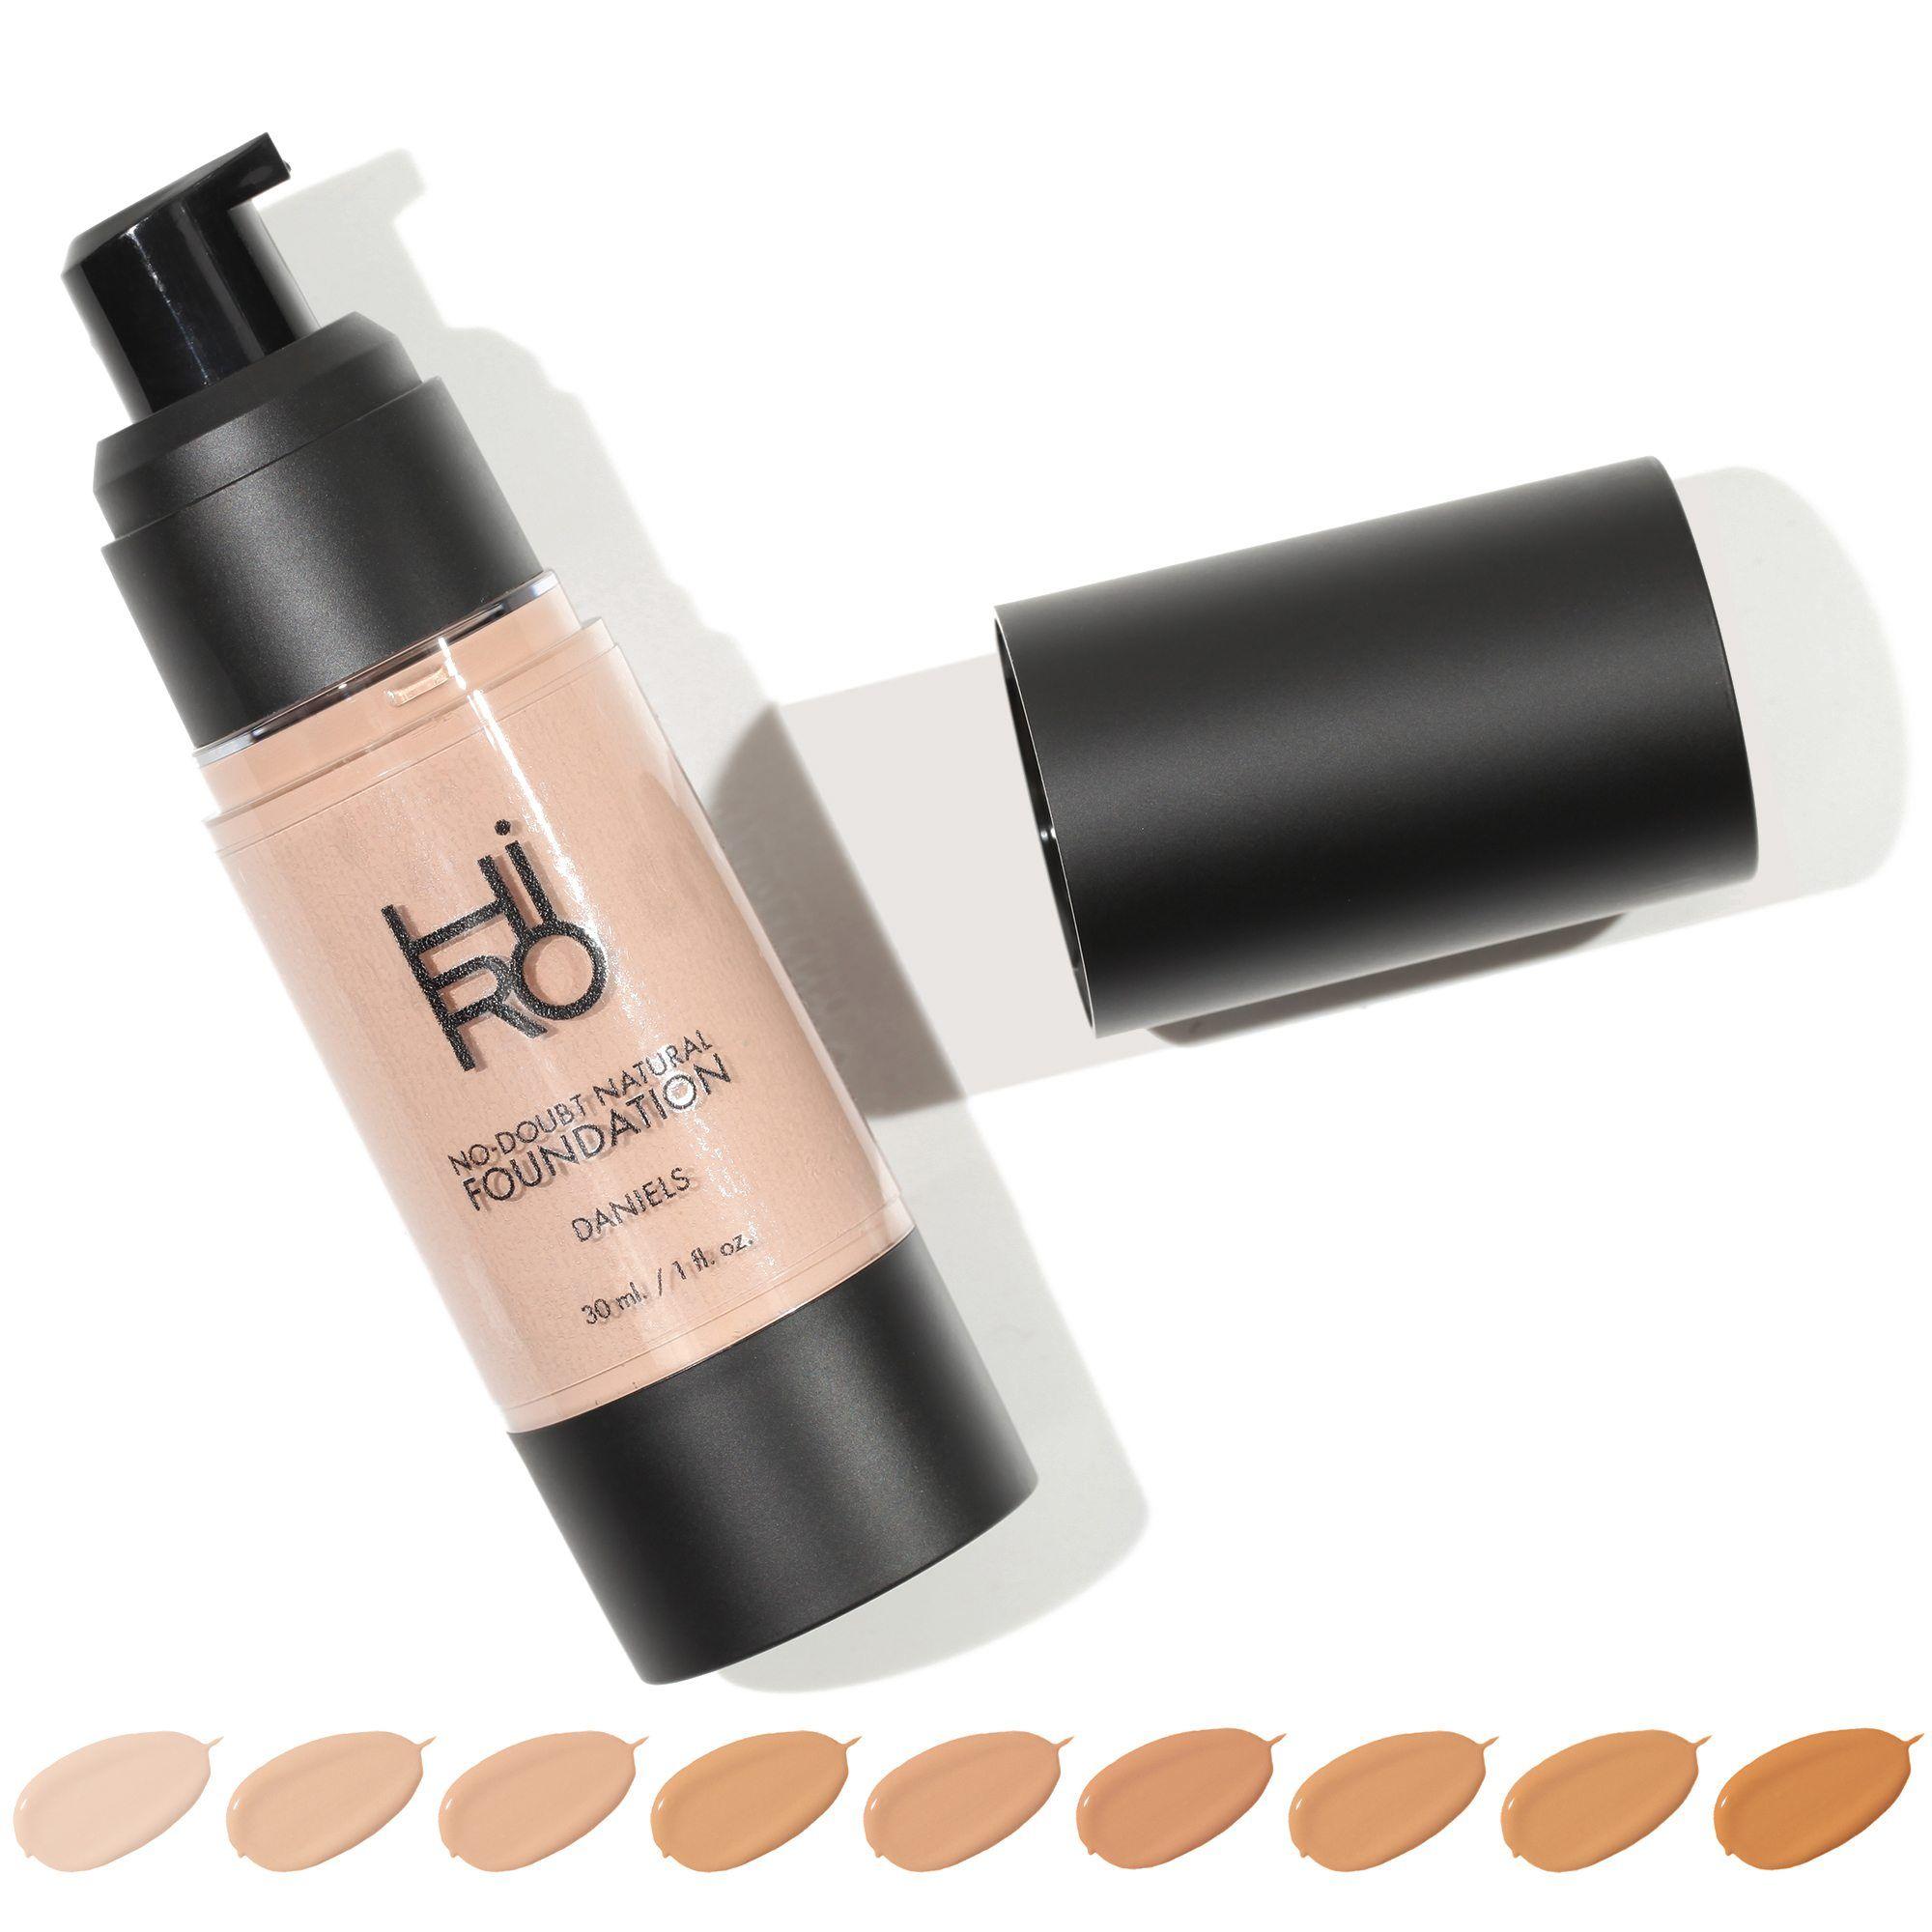 Product Review Hiro Cosmetics No Doubt Natural